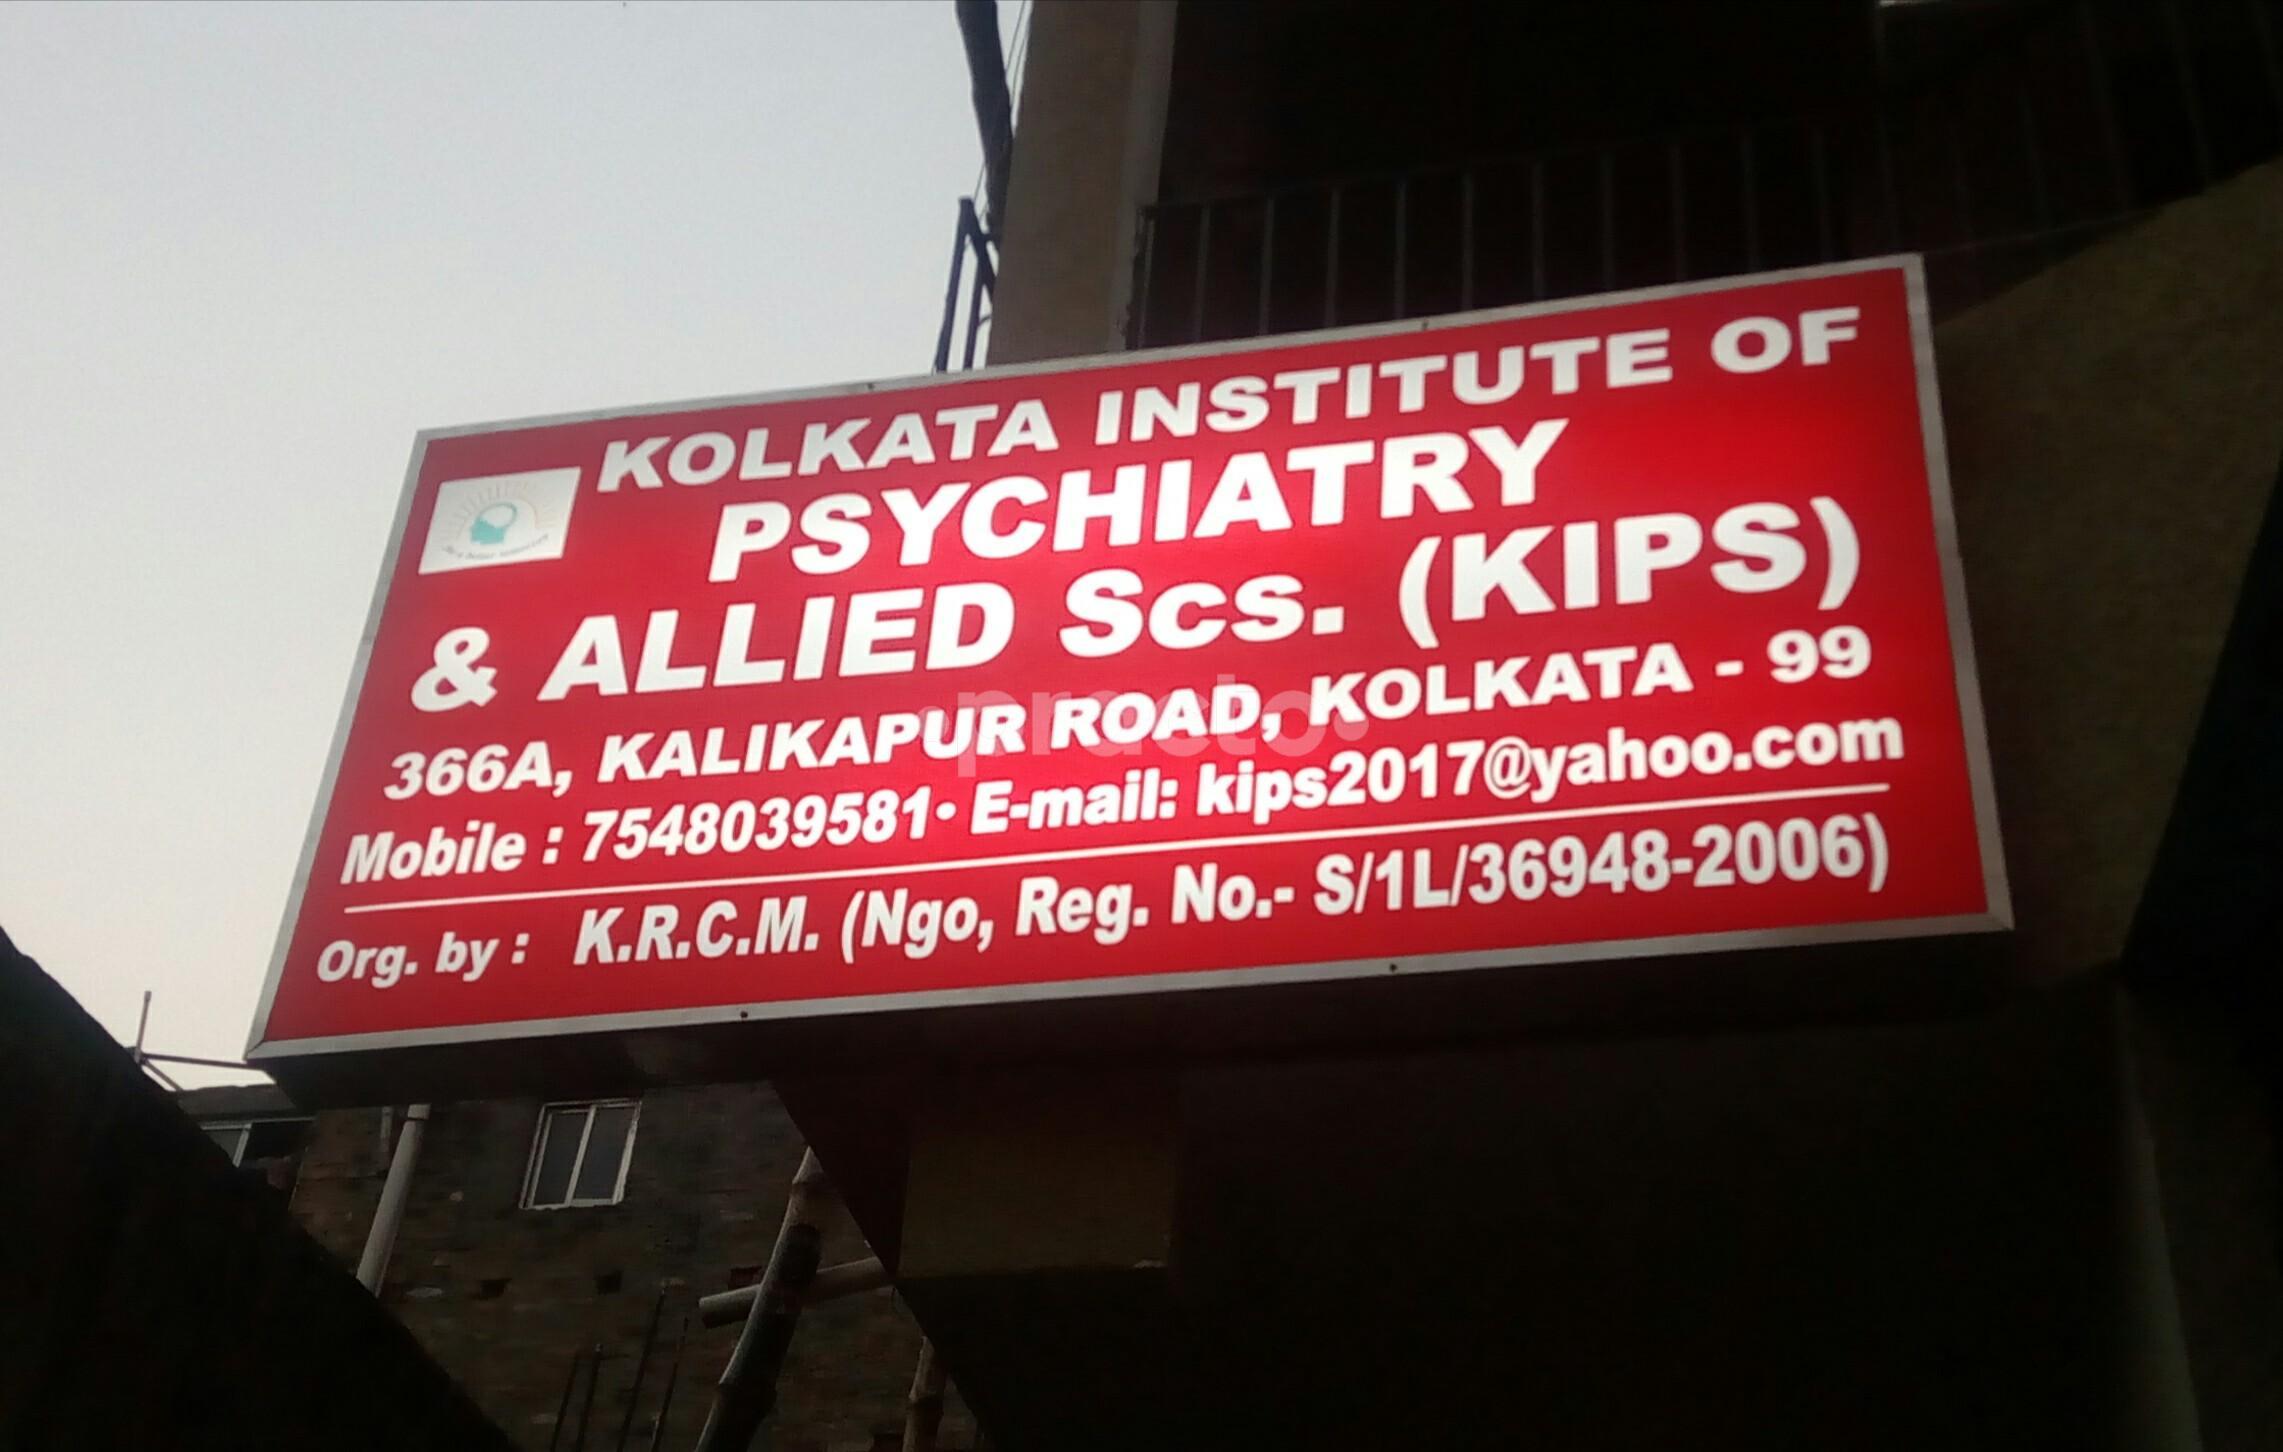 Best Psychiatrist Platform In Kolkata - Book Appointment